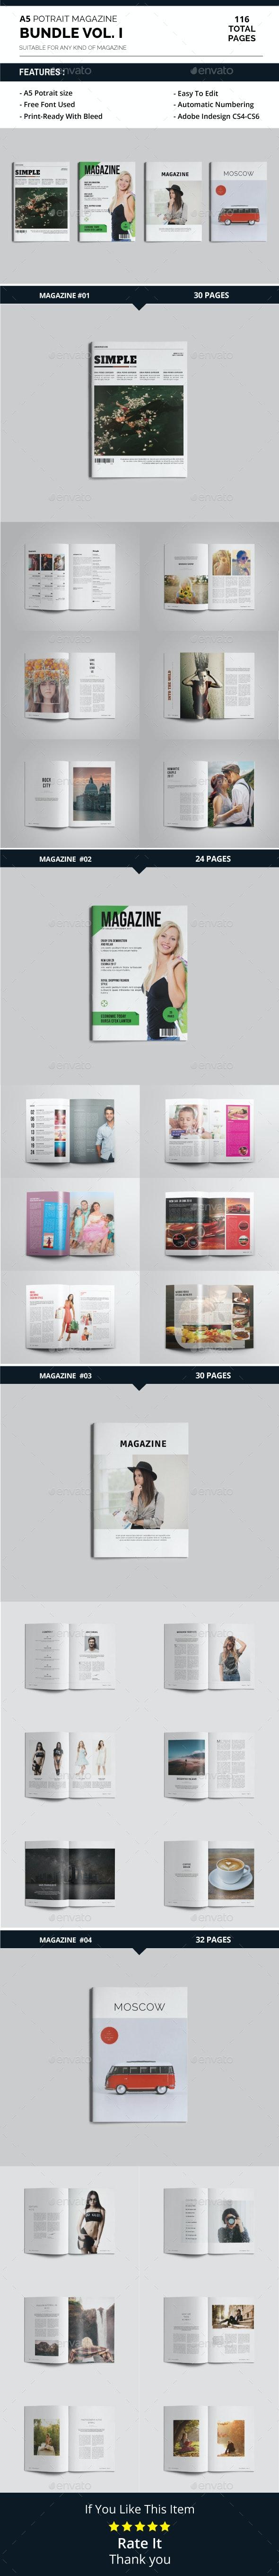 A5 Magazine Bundle Vol. I - Magazines Print Templates